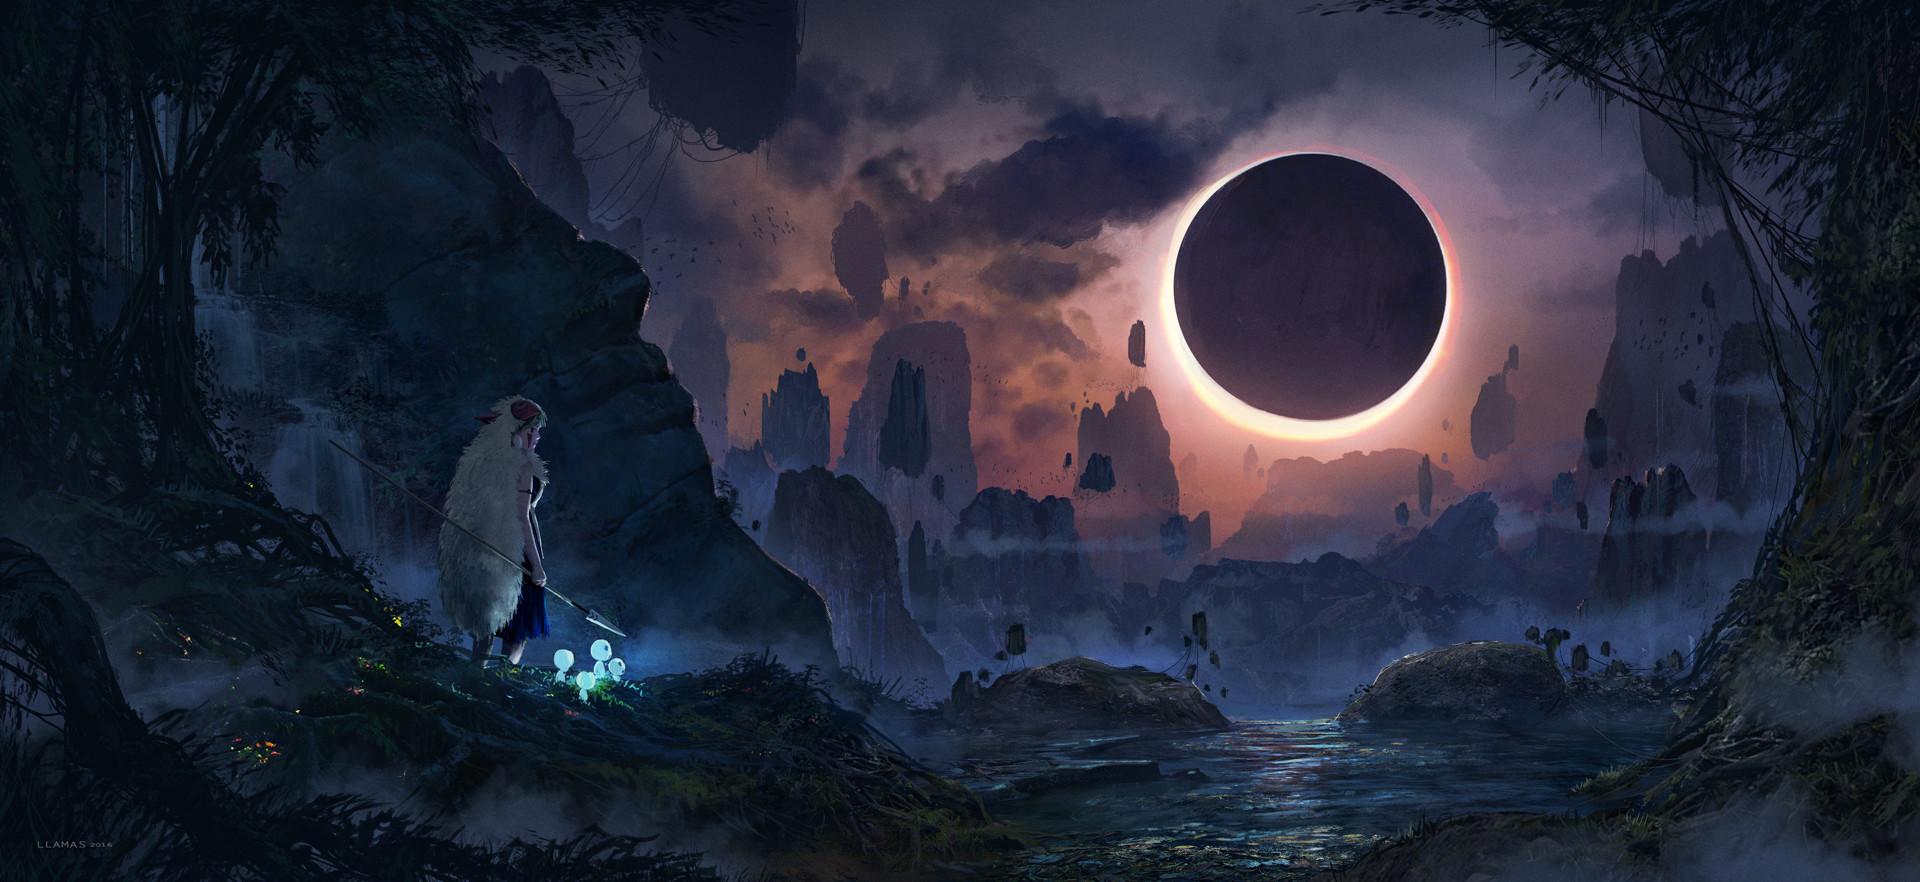 ArtStation-Eclipse-Florent-Llamas-wallpaper-wp3602741